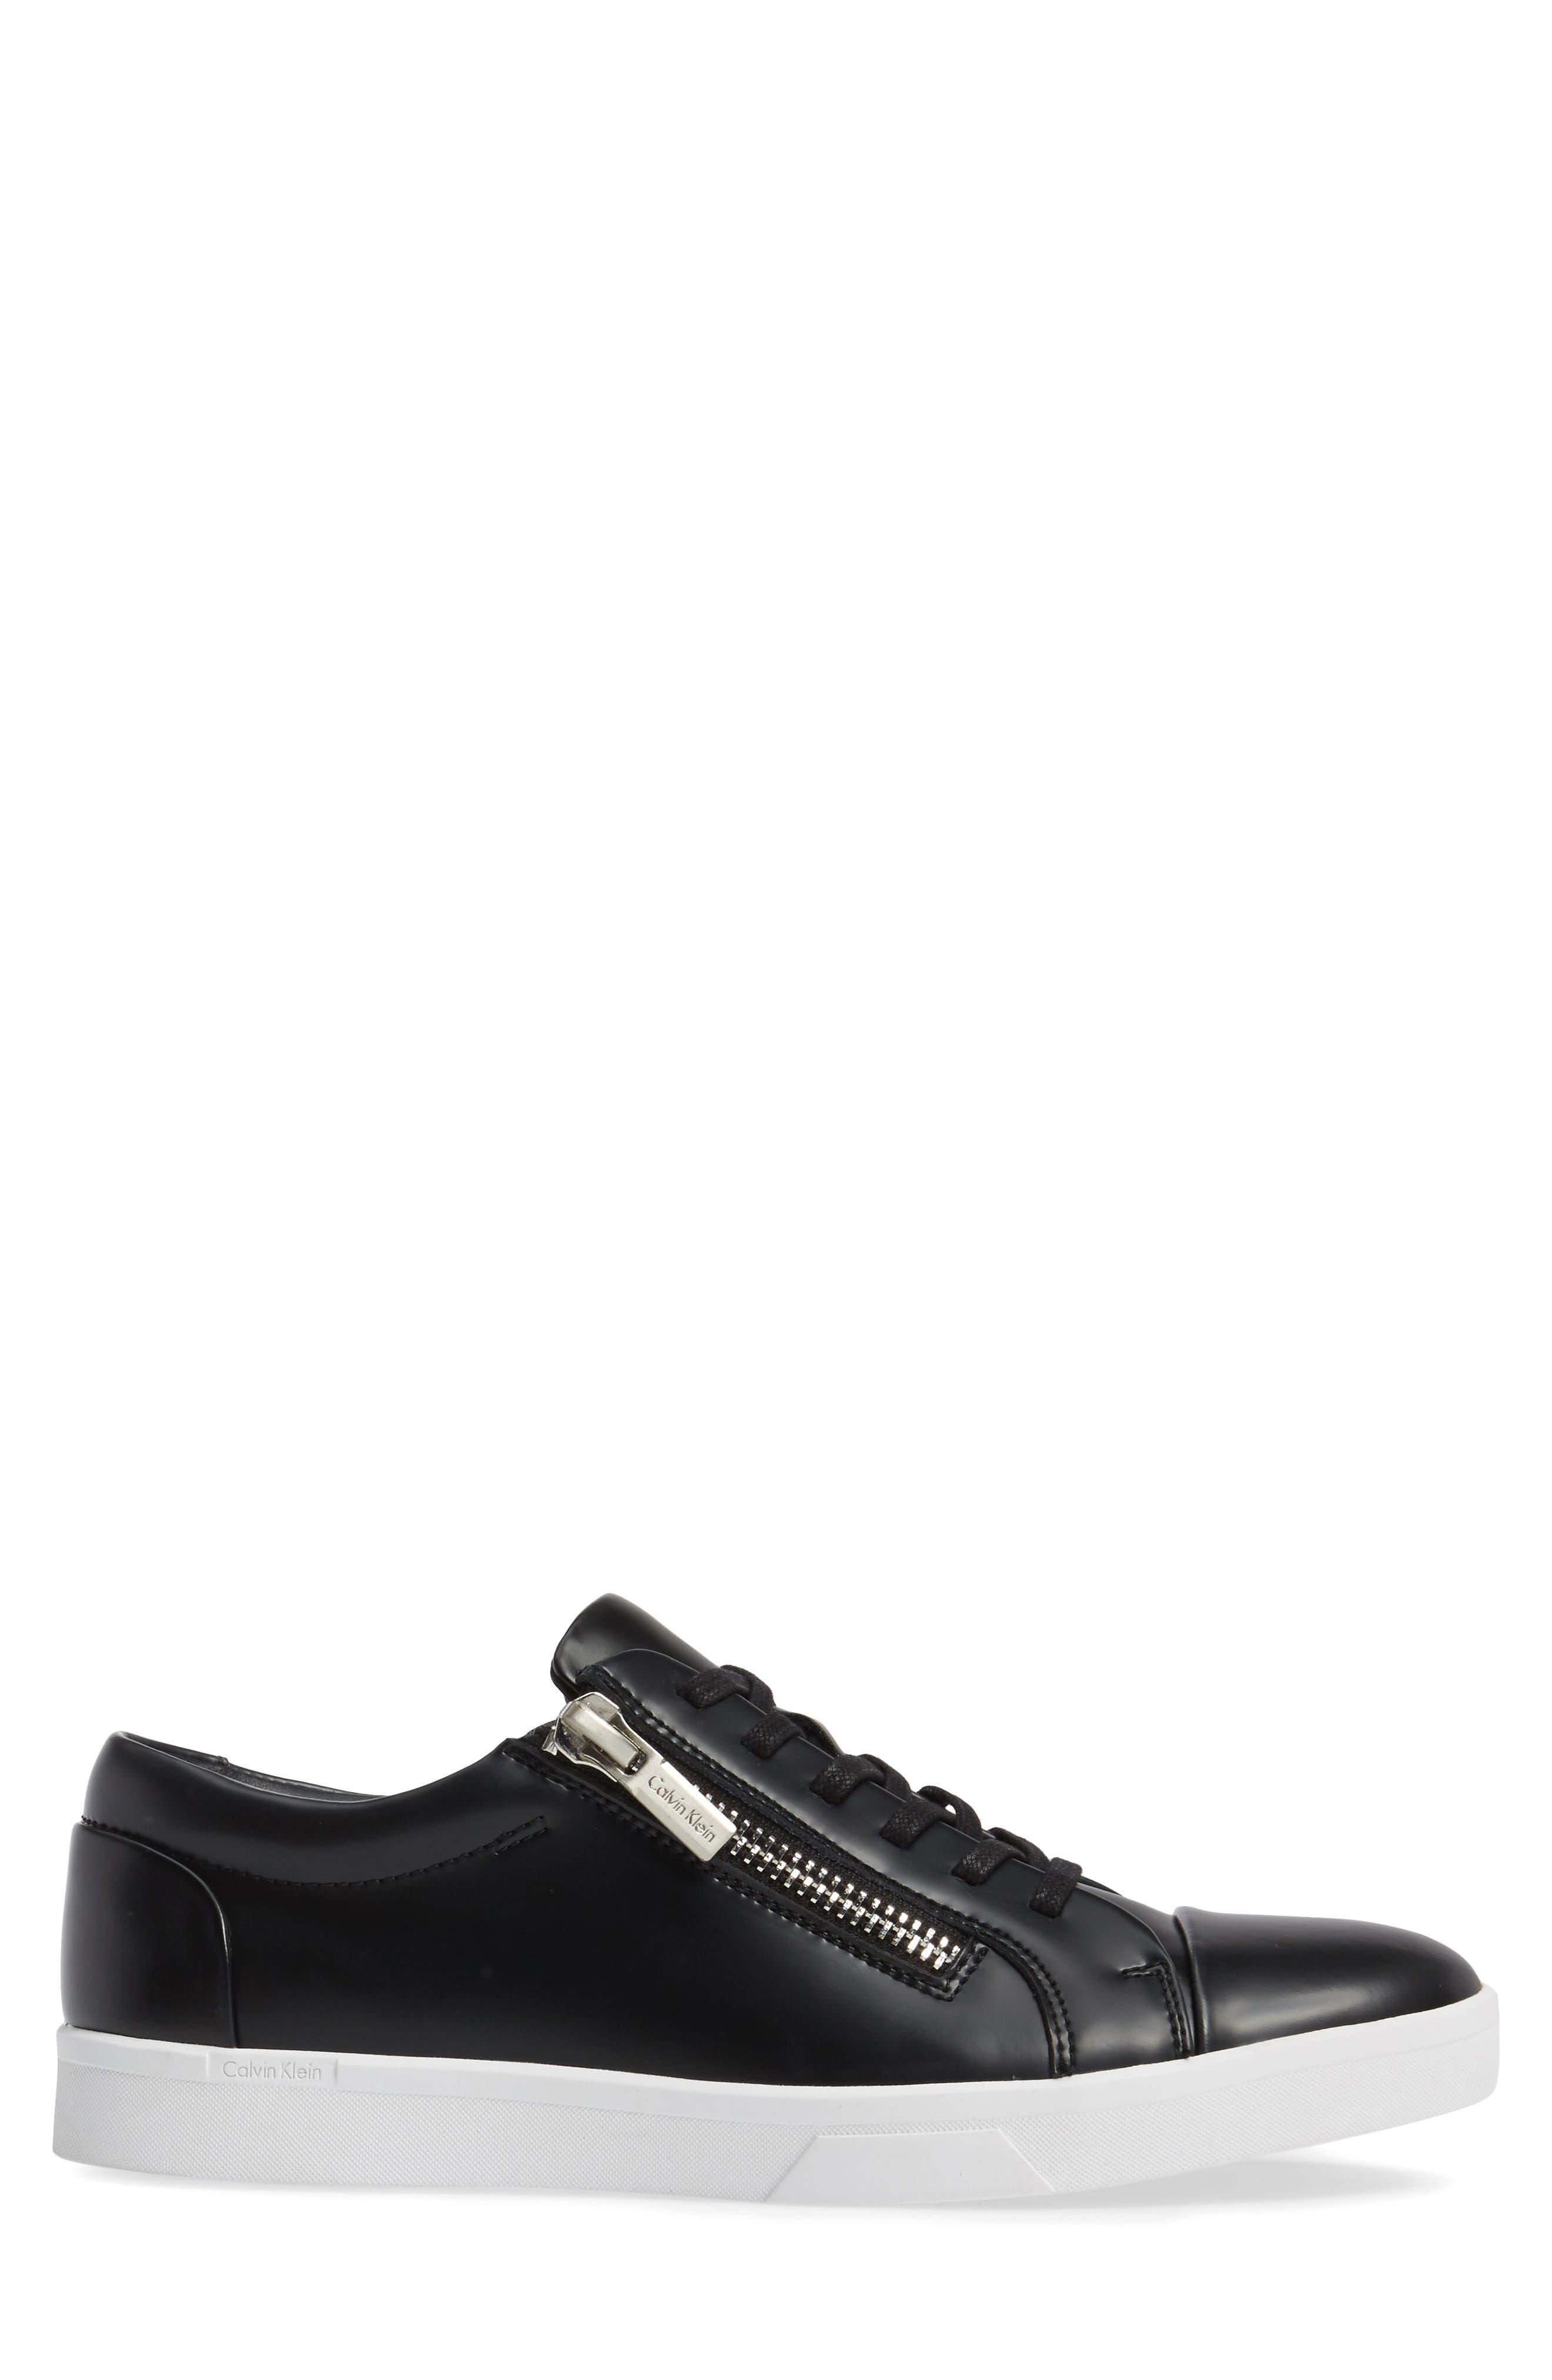 Ibrahim Cap-Toe Zip Sneaker,                             Alternate thumbnail 3, color,                             Black Leather